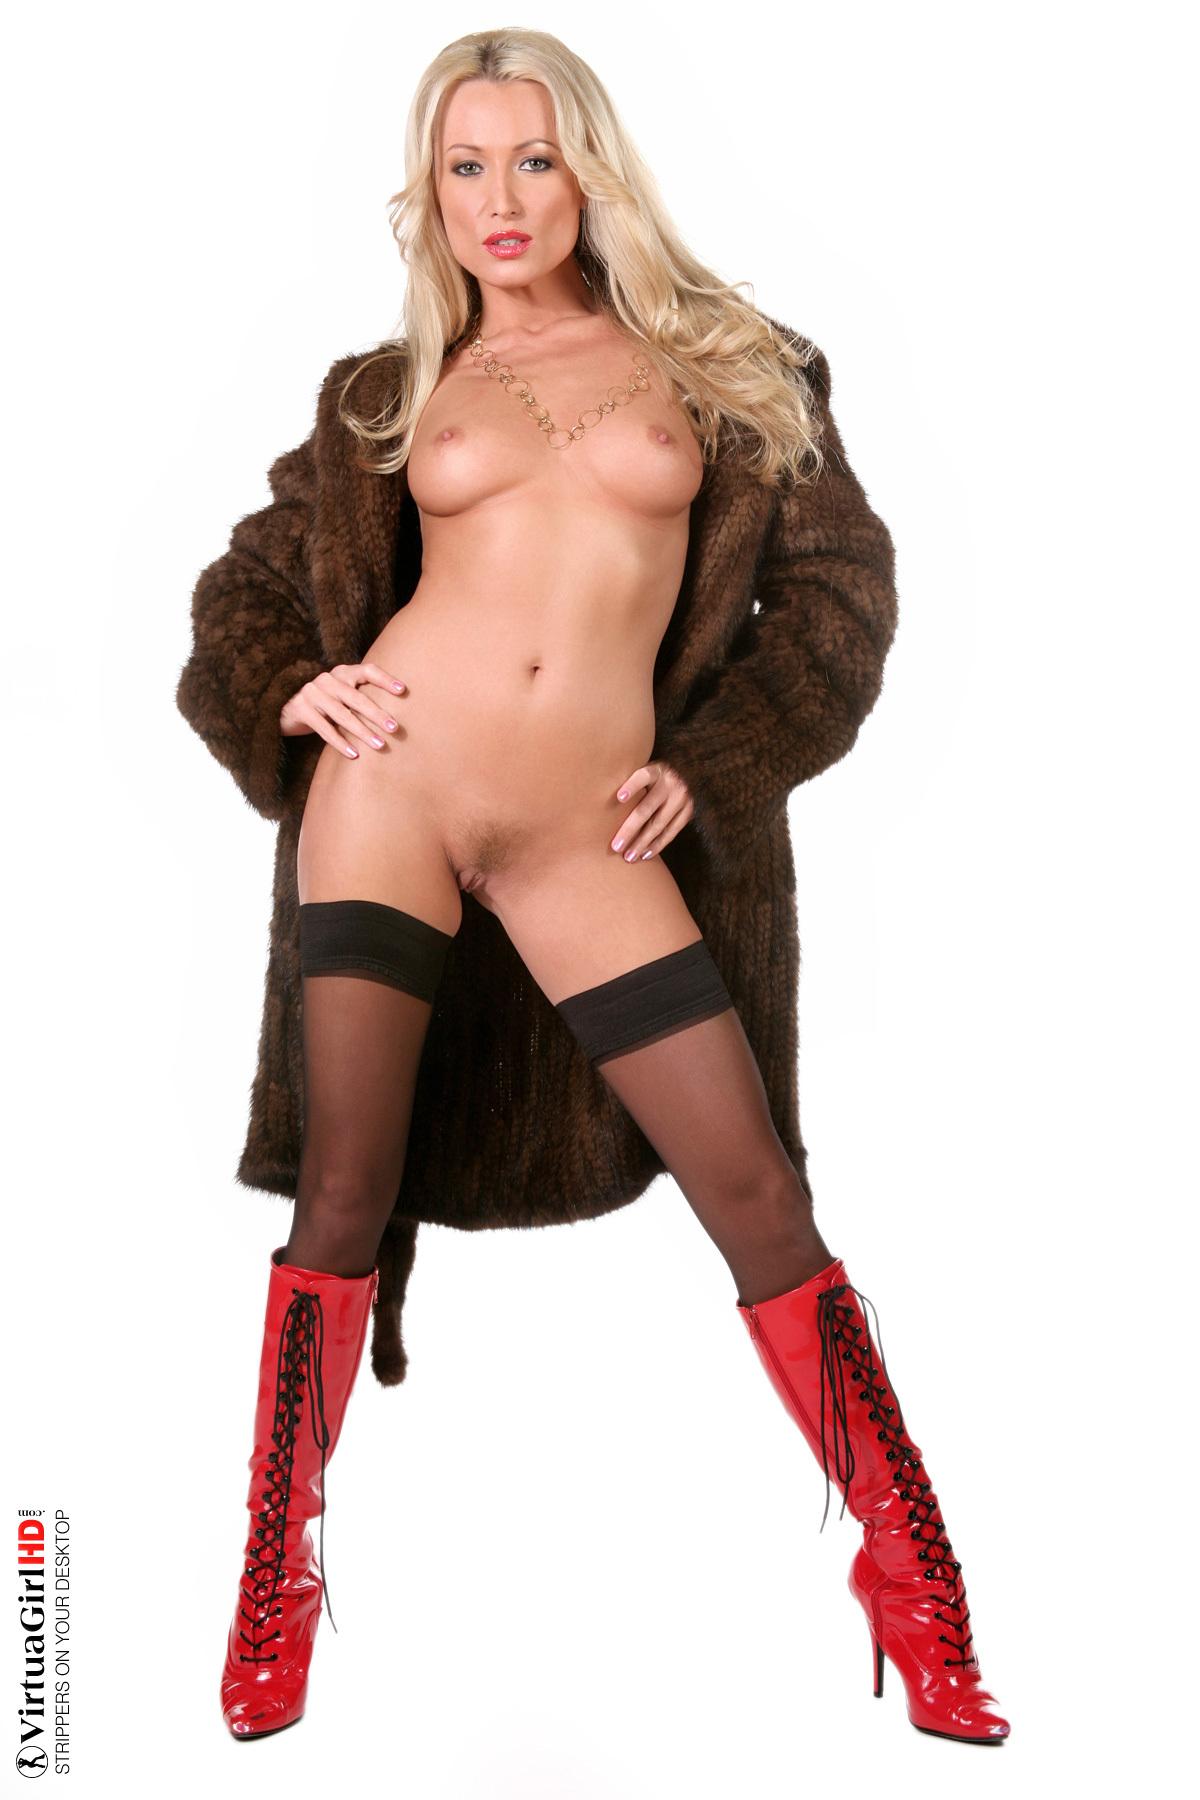 hot girl striptease sexy nude poledance desktop stripper alexsis faye